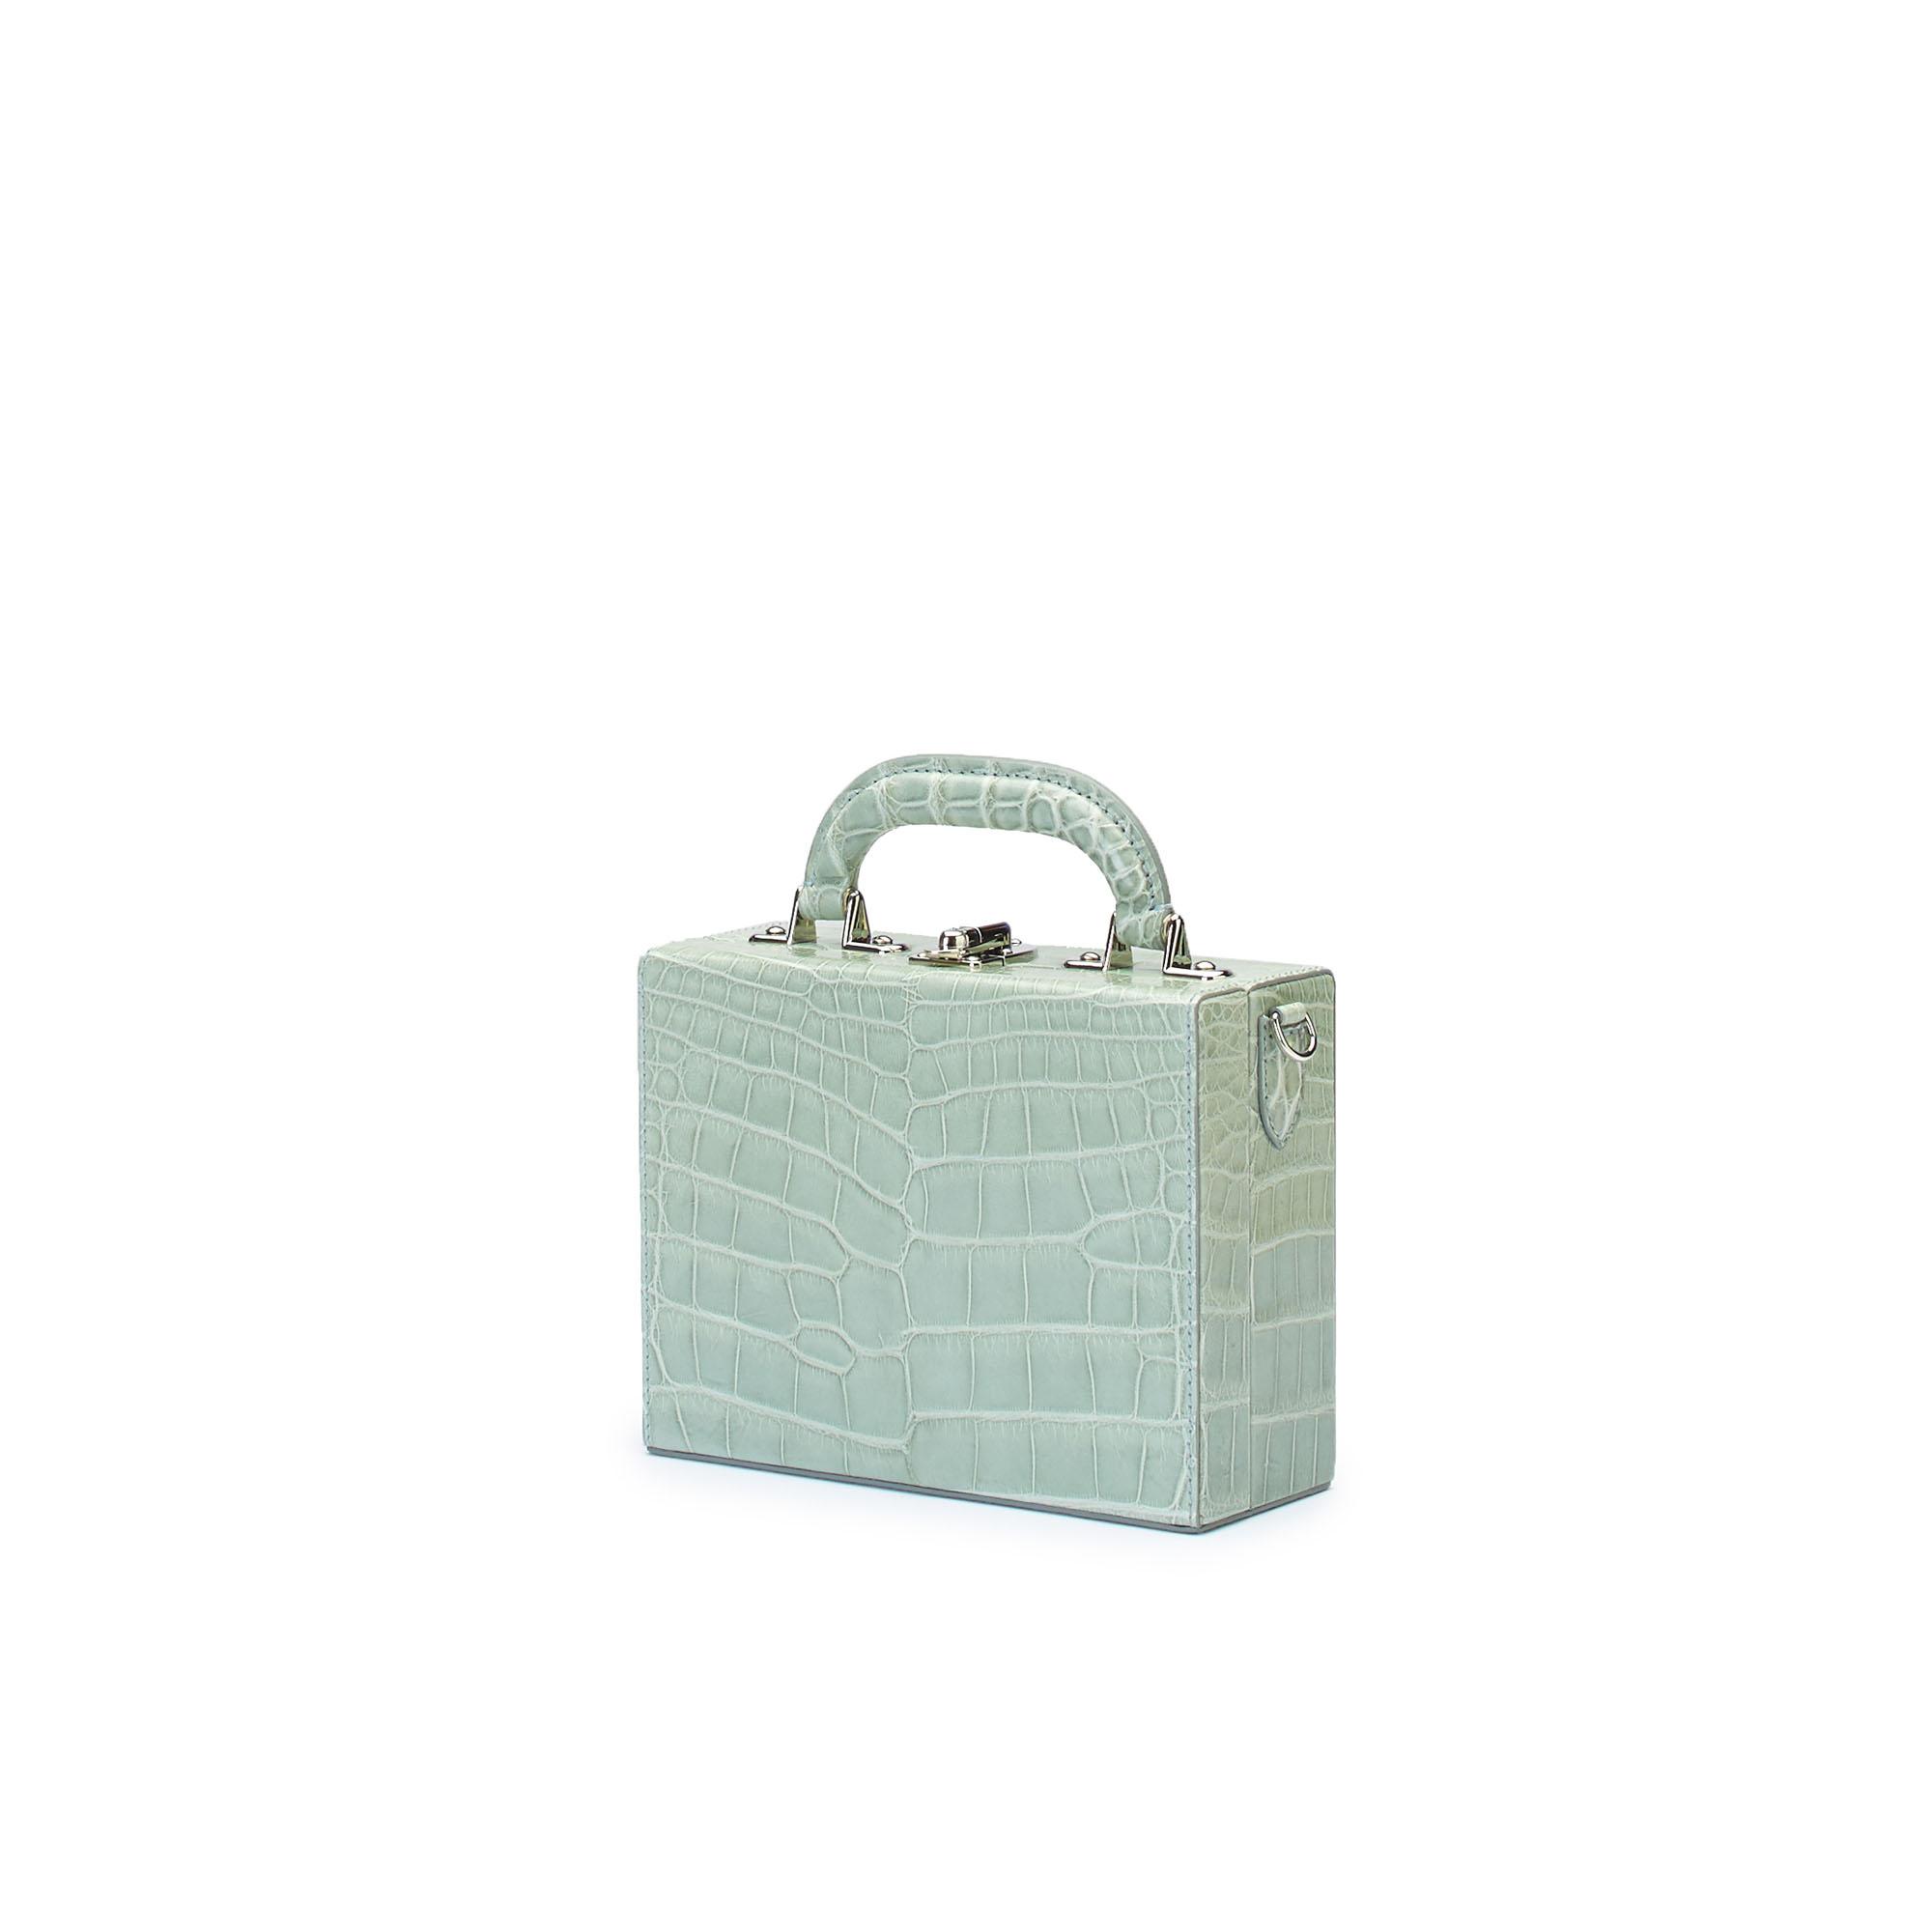 The seafoam green alligator Squared Bertoncina suitcase by Bertoni 1949 02